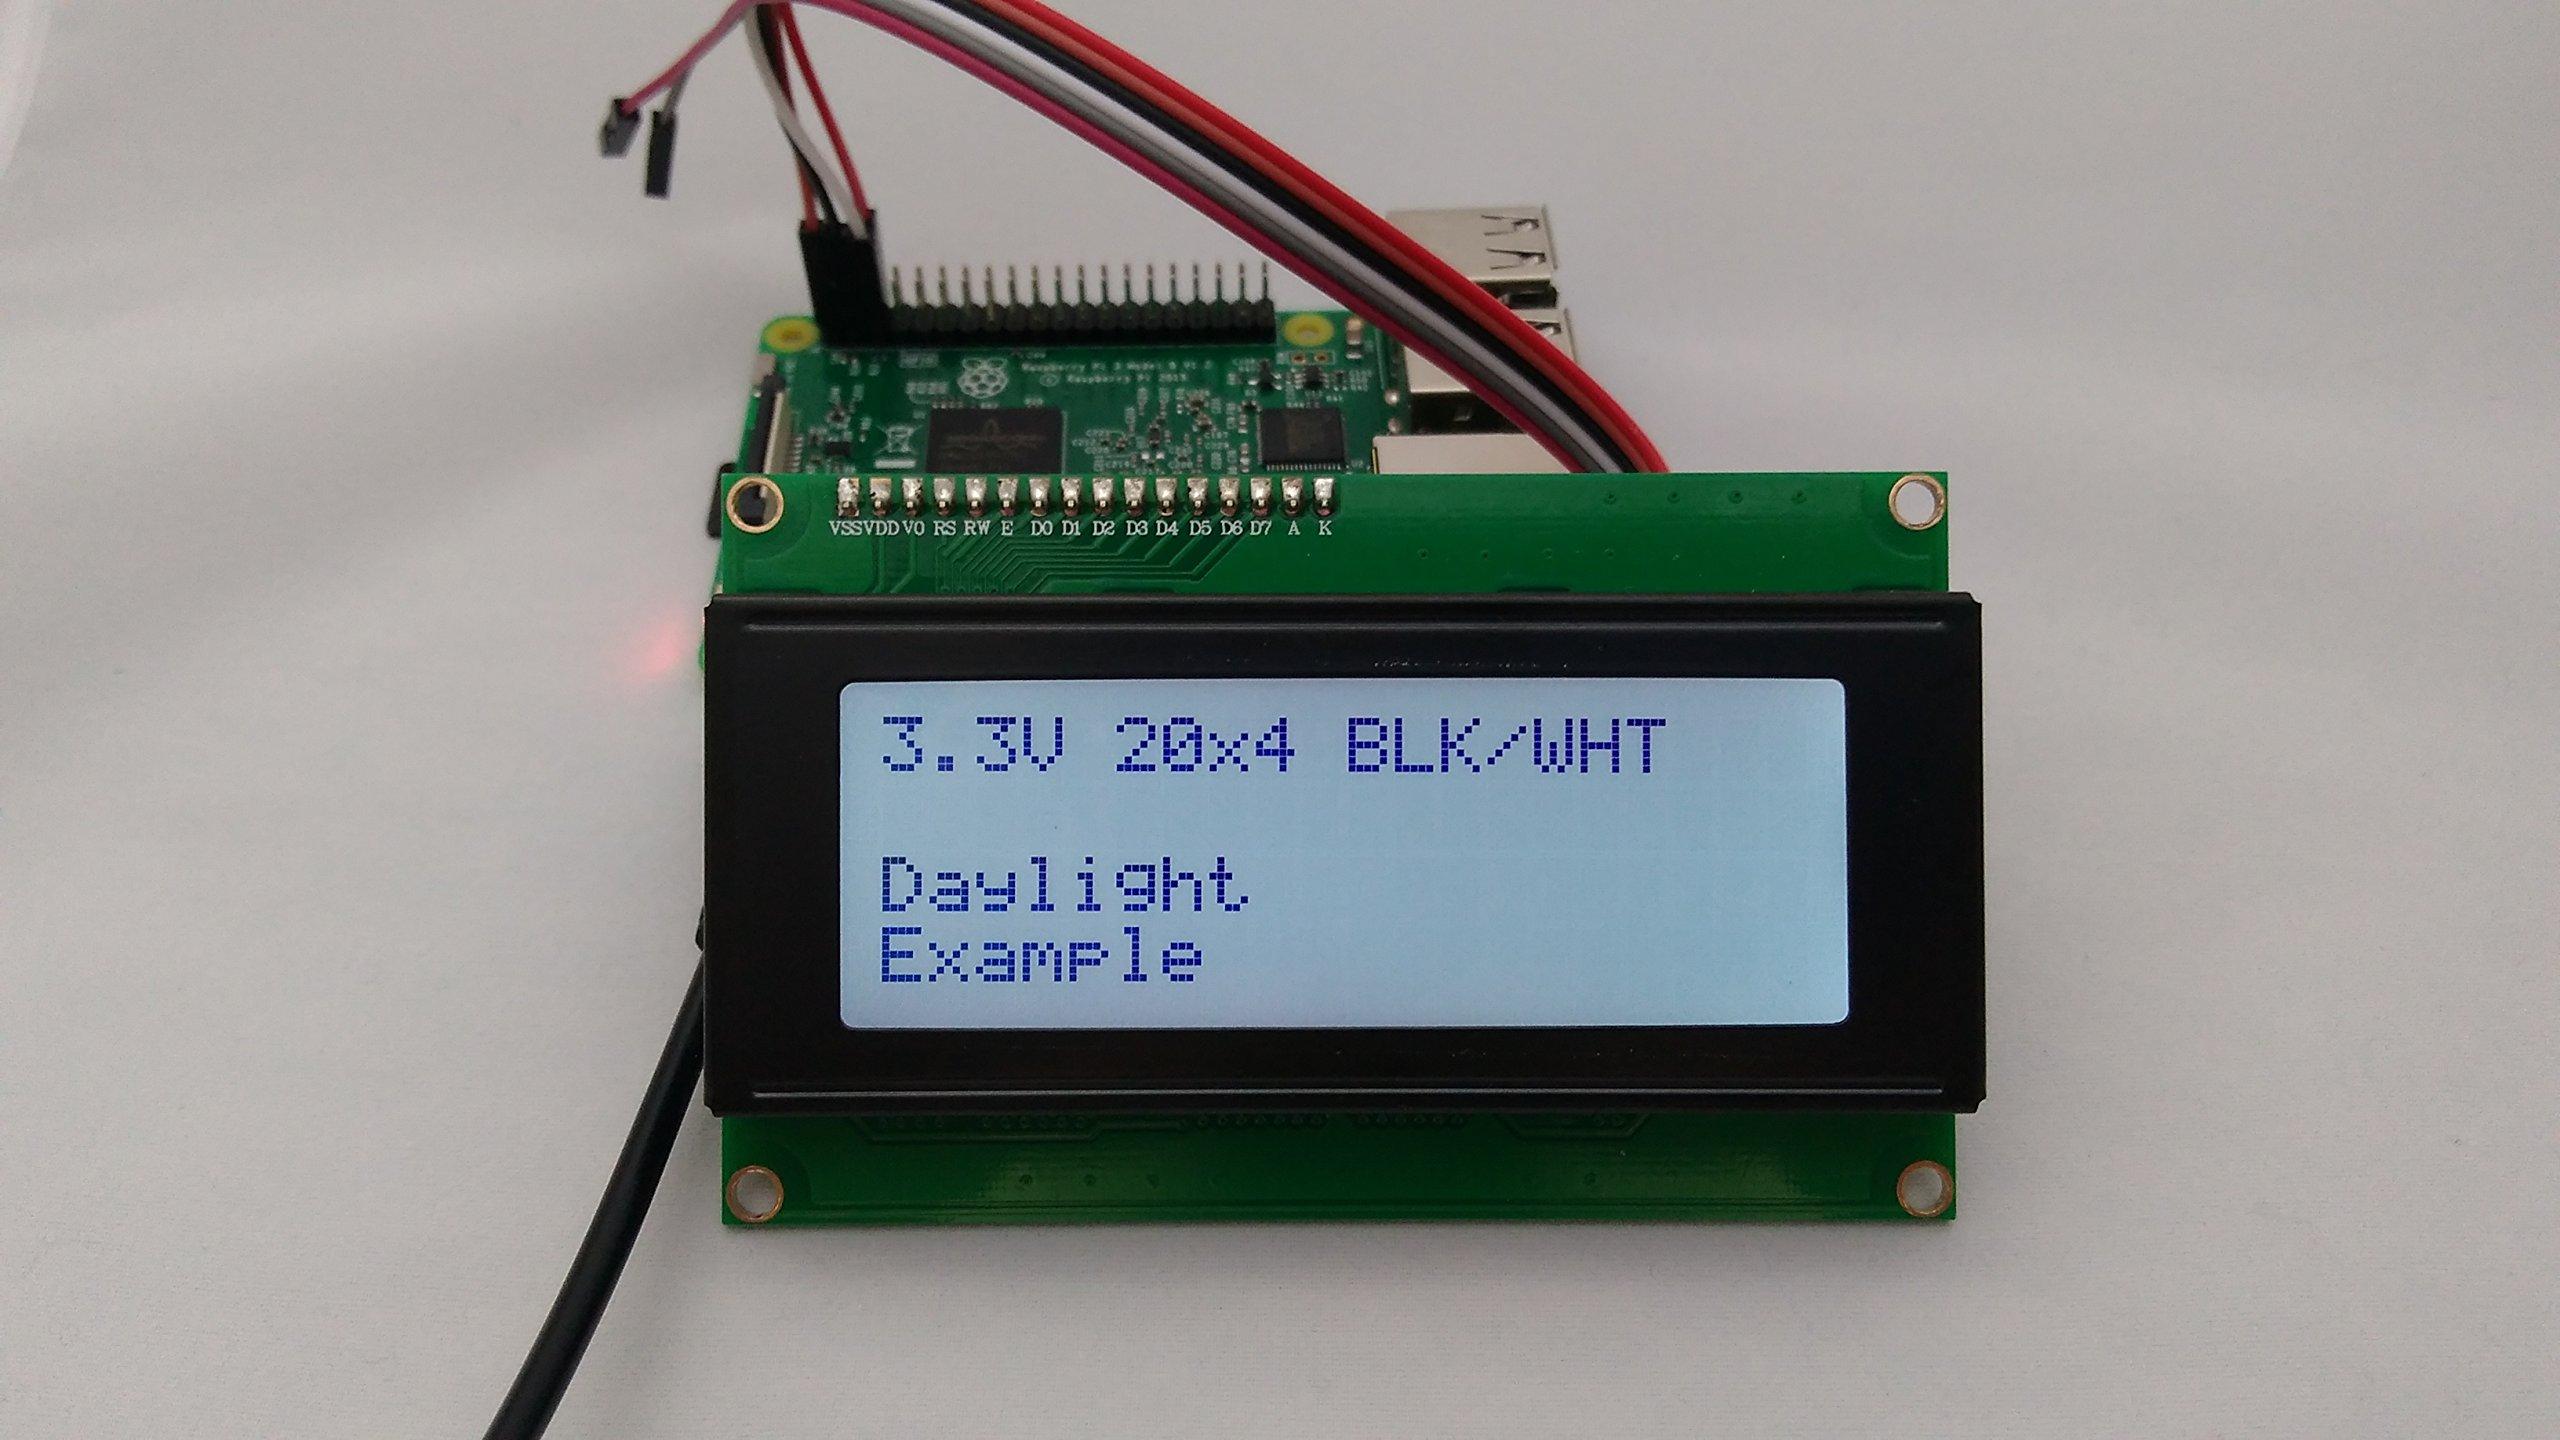 SPI I2C UART 20x4 LCD Black Text, White Background by rpigear